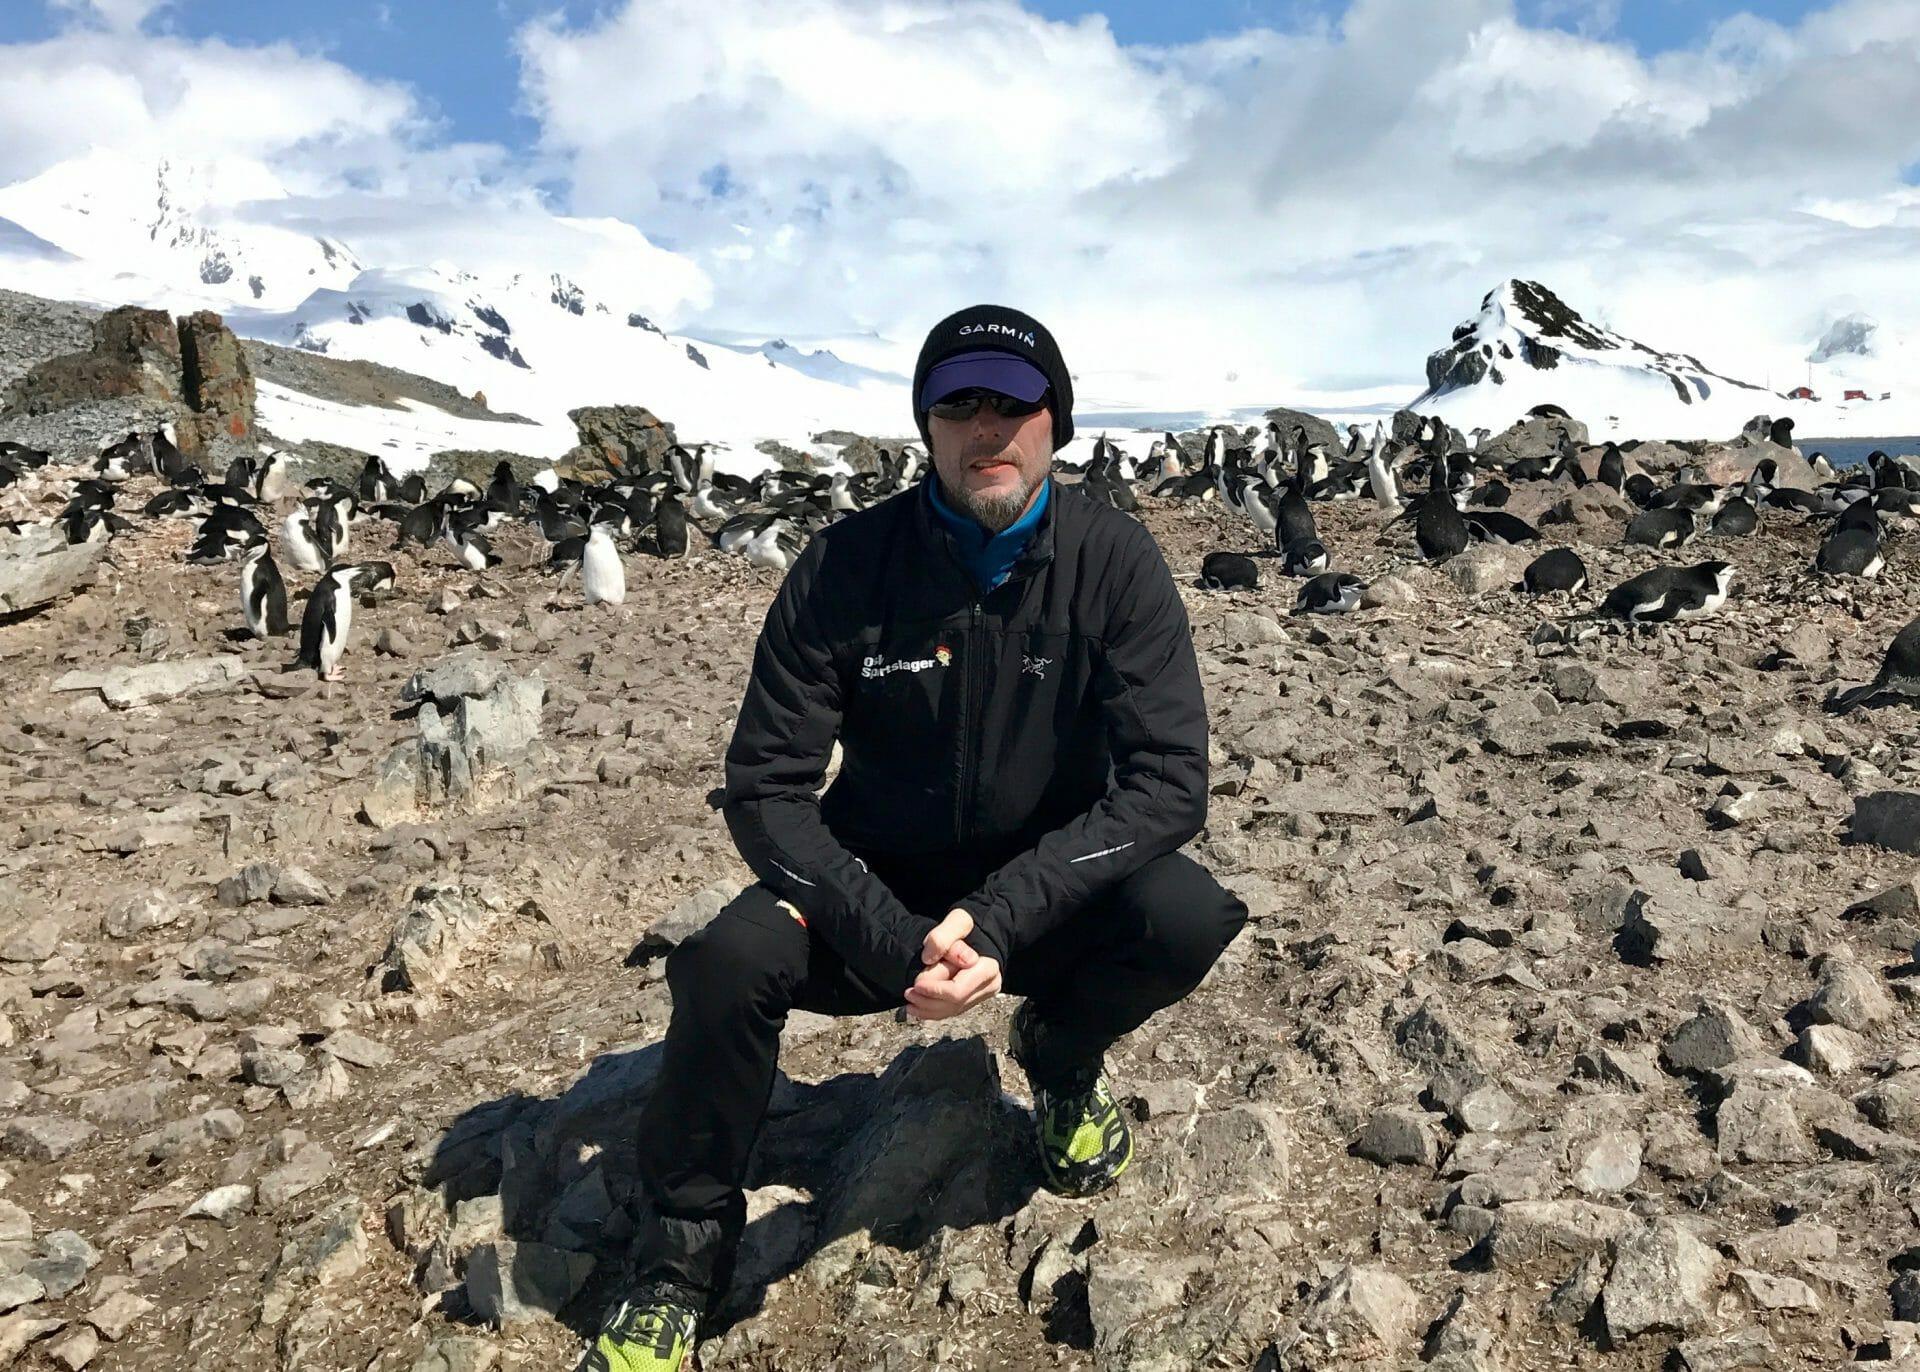 Antarktis - Arc'teryx